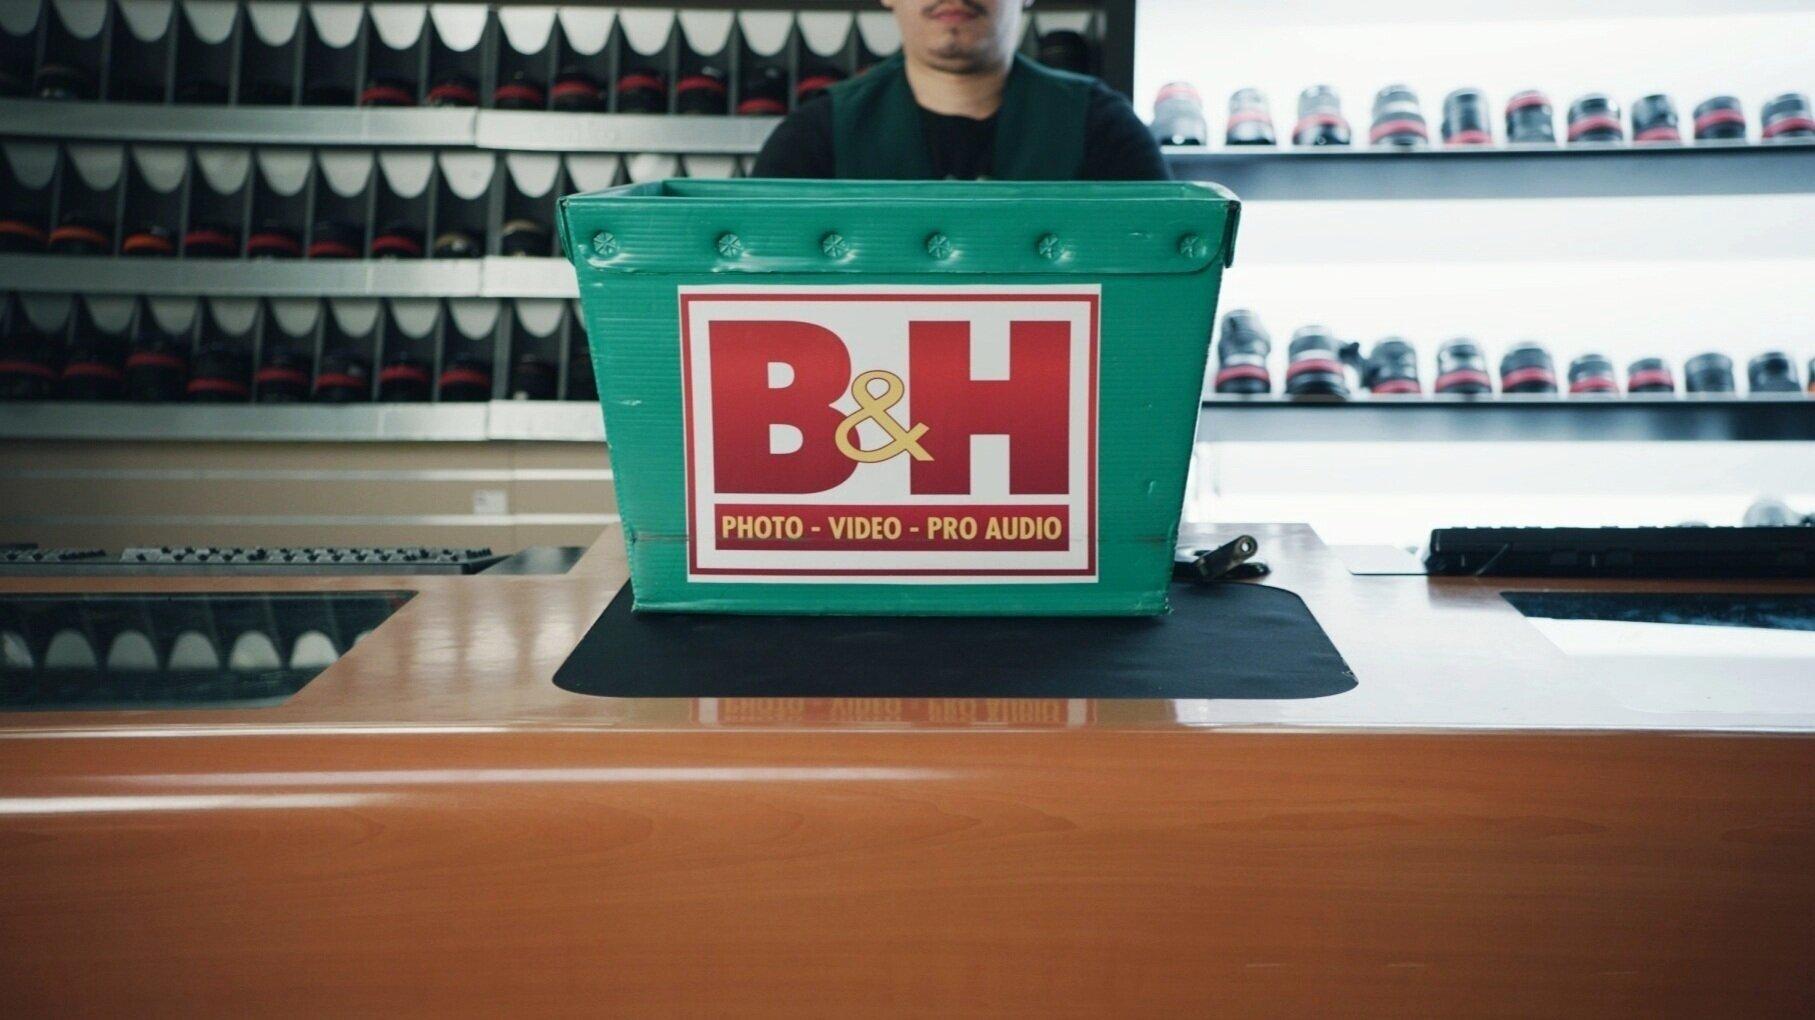 04 - Ads: B&H